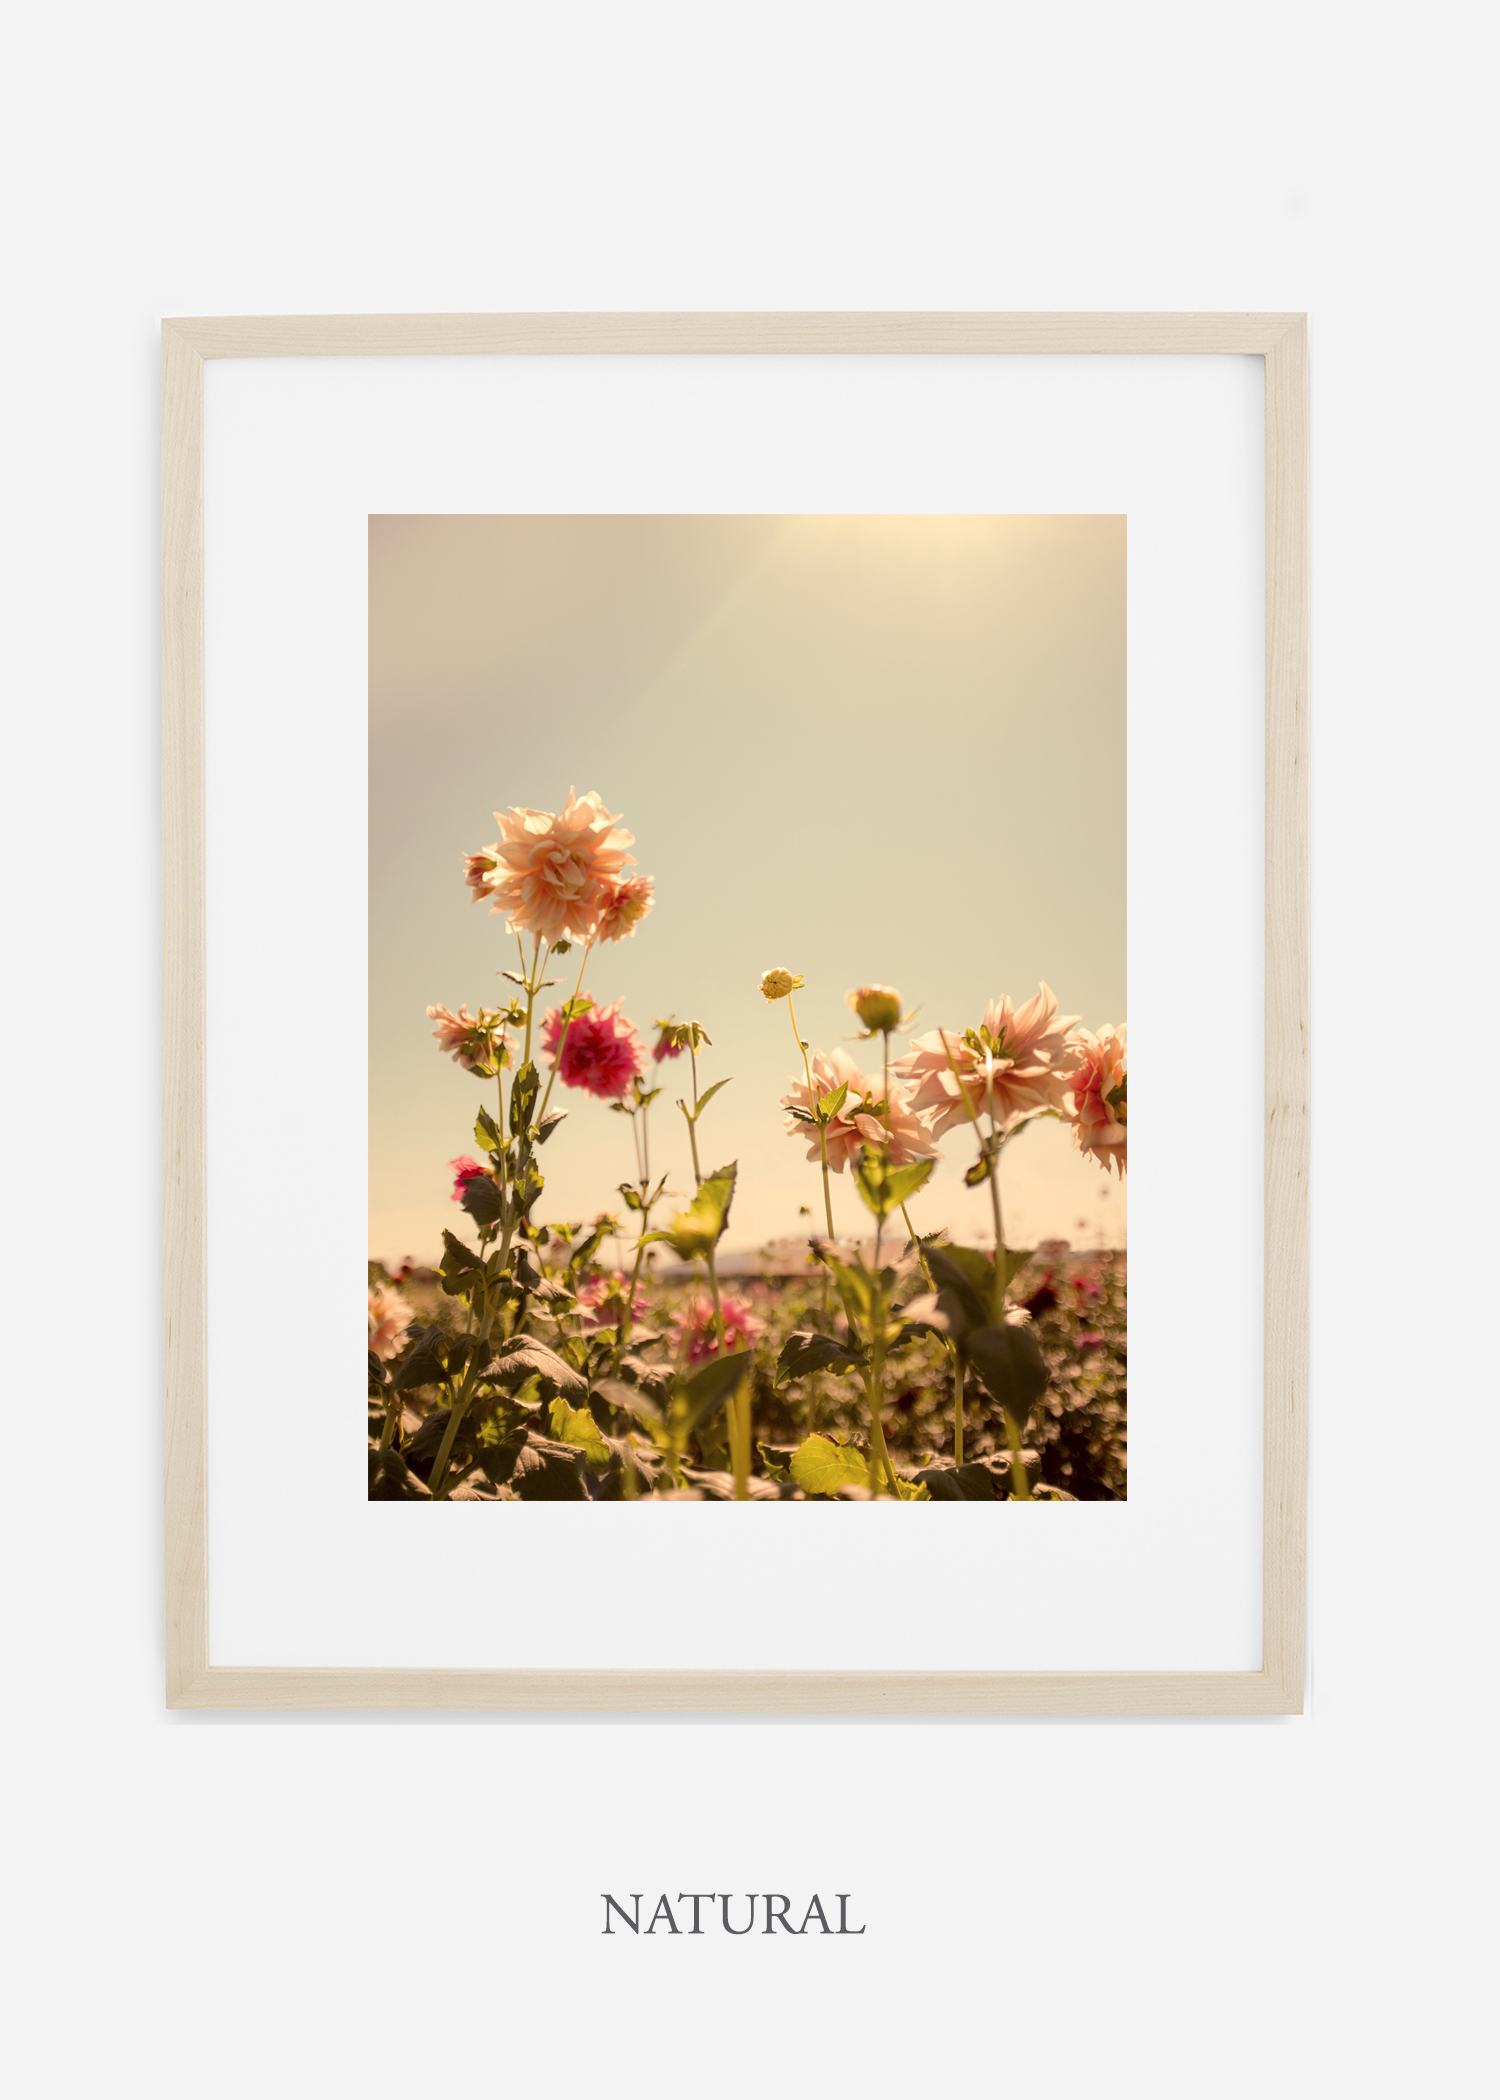 DahliaNo.3_naturalframe__mat_interiordesign_botanicalprint_art.jpg